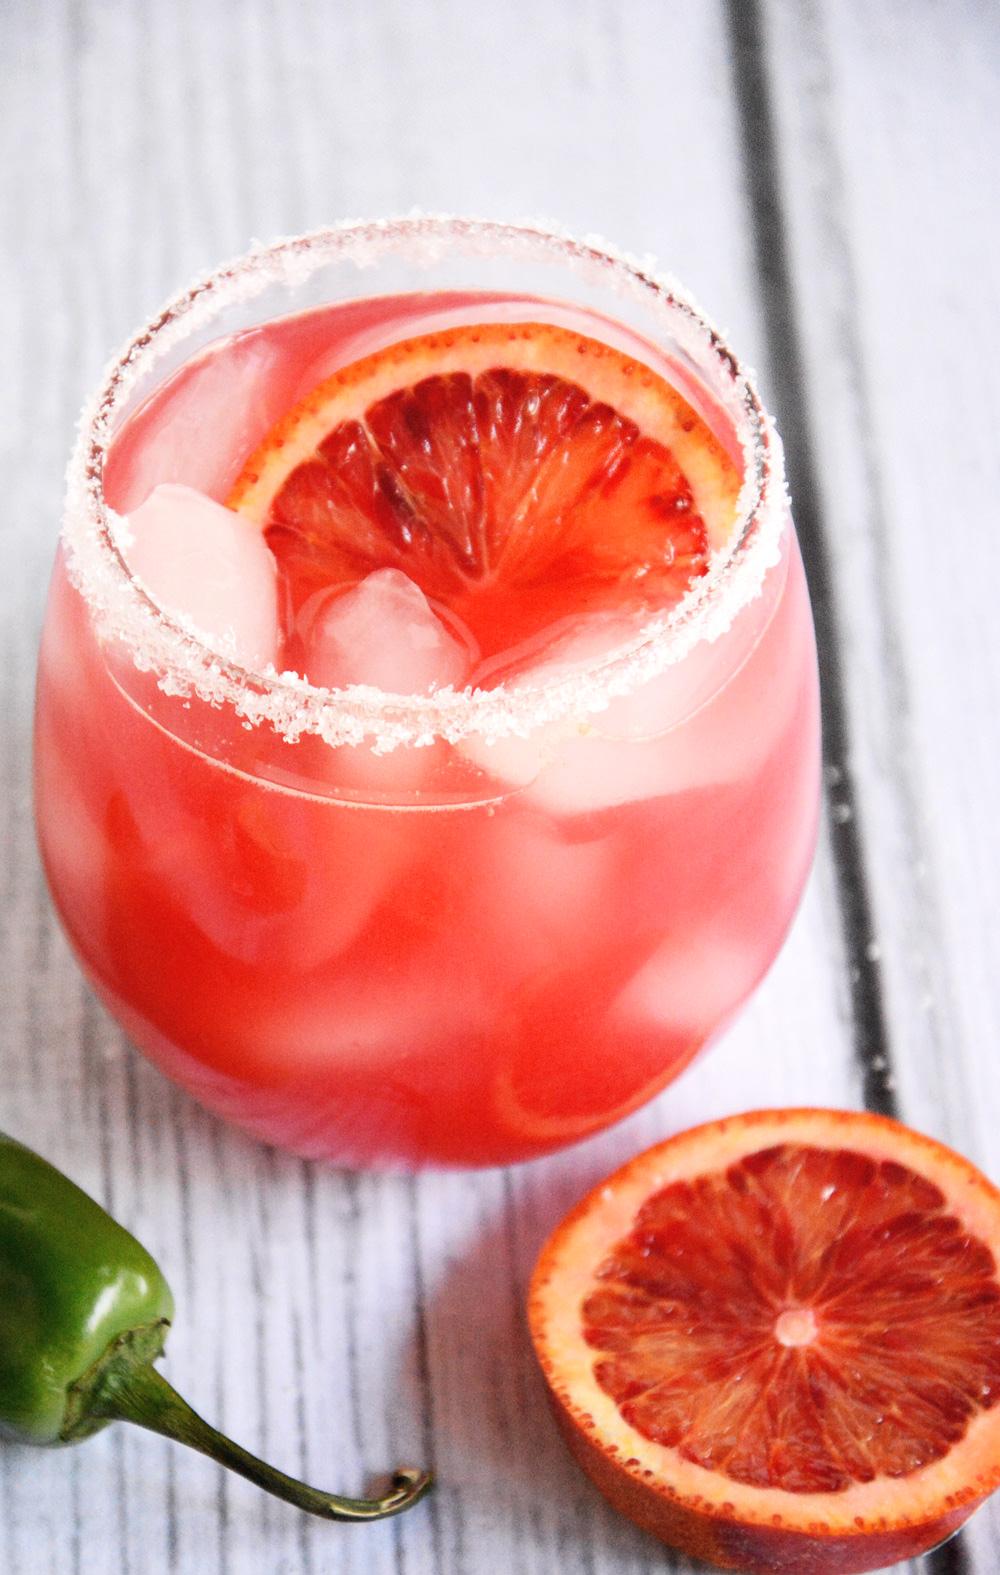 This Blood Orange Margarita Recipe is a refreshing twist on a classic margarita with fresh blood orange juice, triple sec, and fresh lime juice!